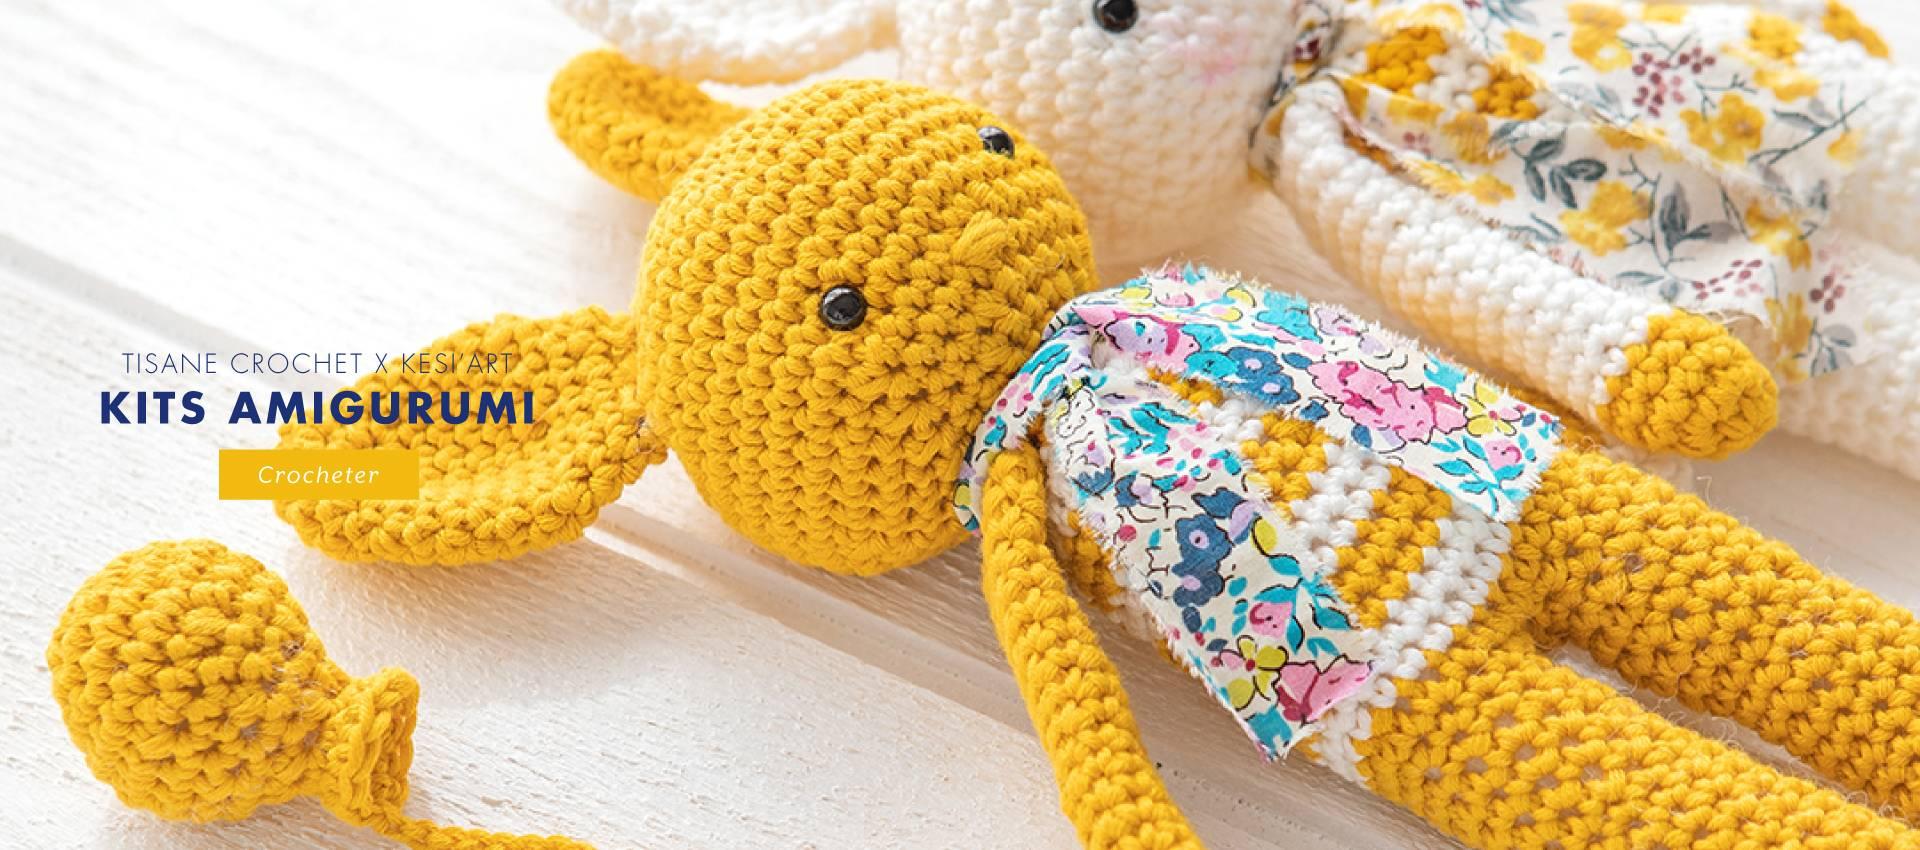 COLLAB' TISANE CROCHET X KESI'ART : 3 kits crochet amigurimi à croquer et à crocheter !